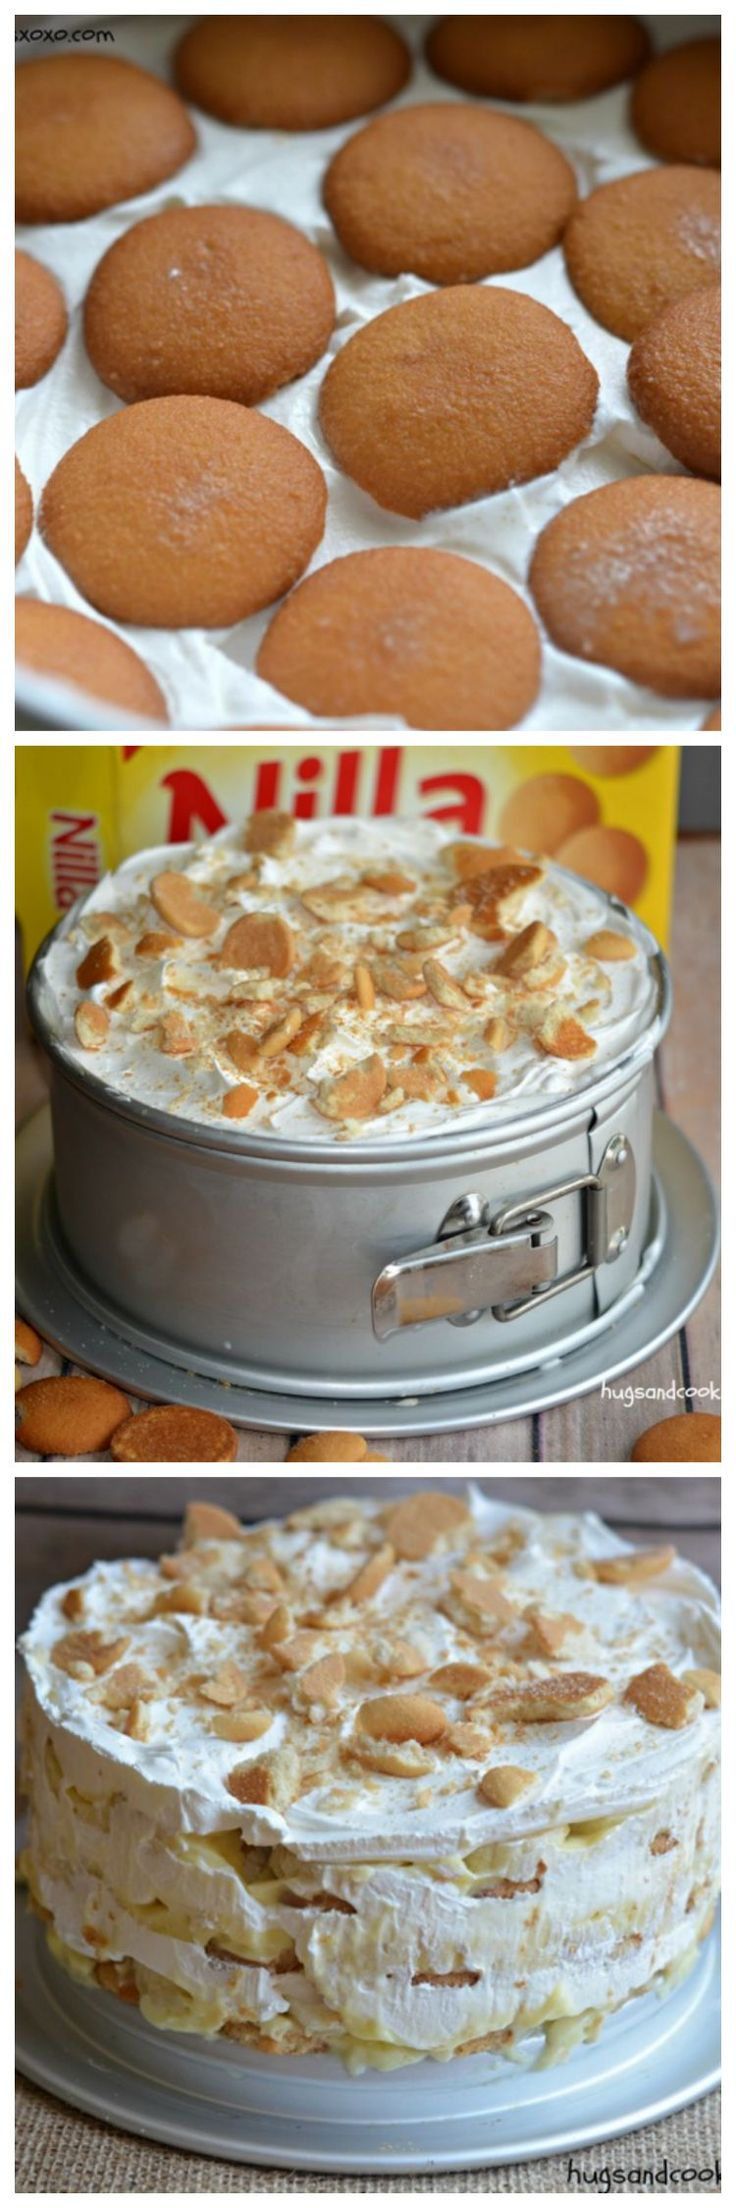 banana ice box cake. Ingredients: Nilla wafers, milk, banana pudding, cool whip, bananas